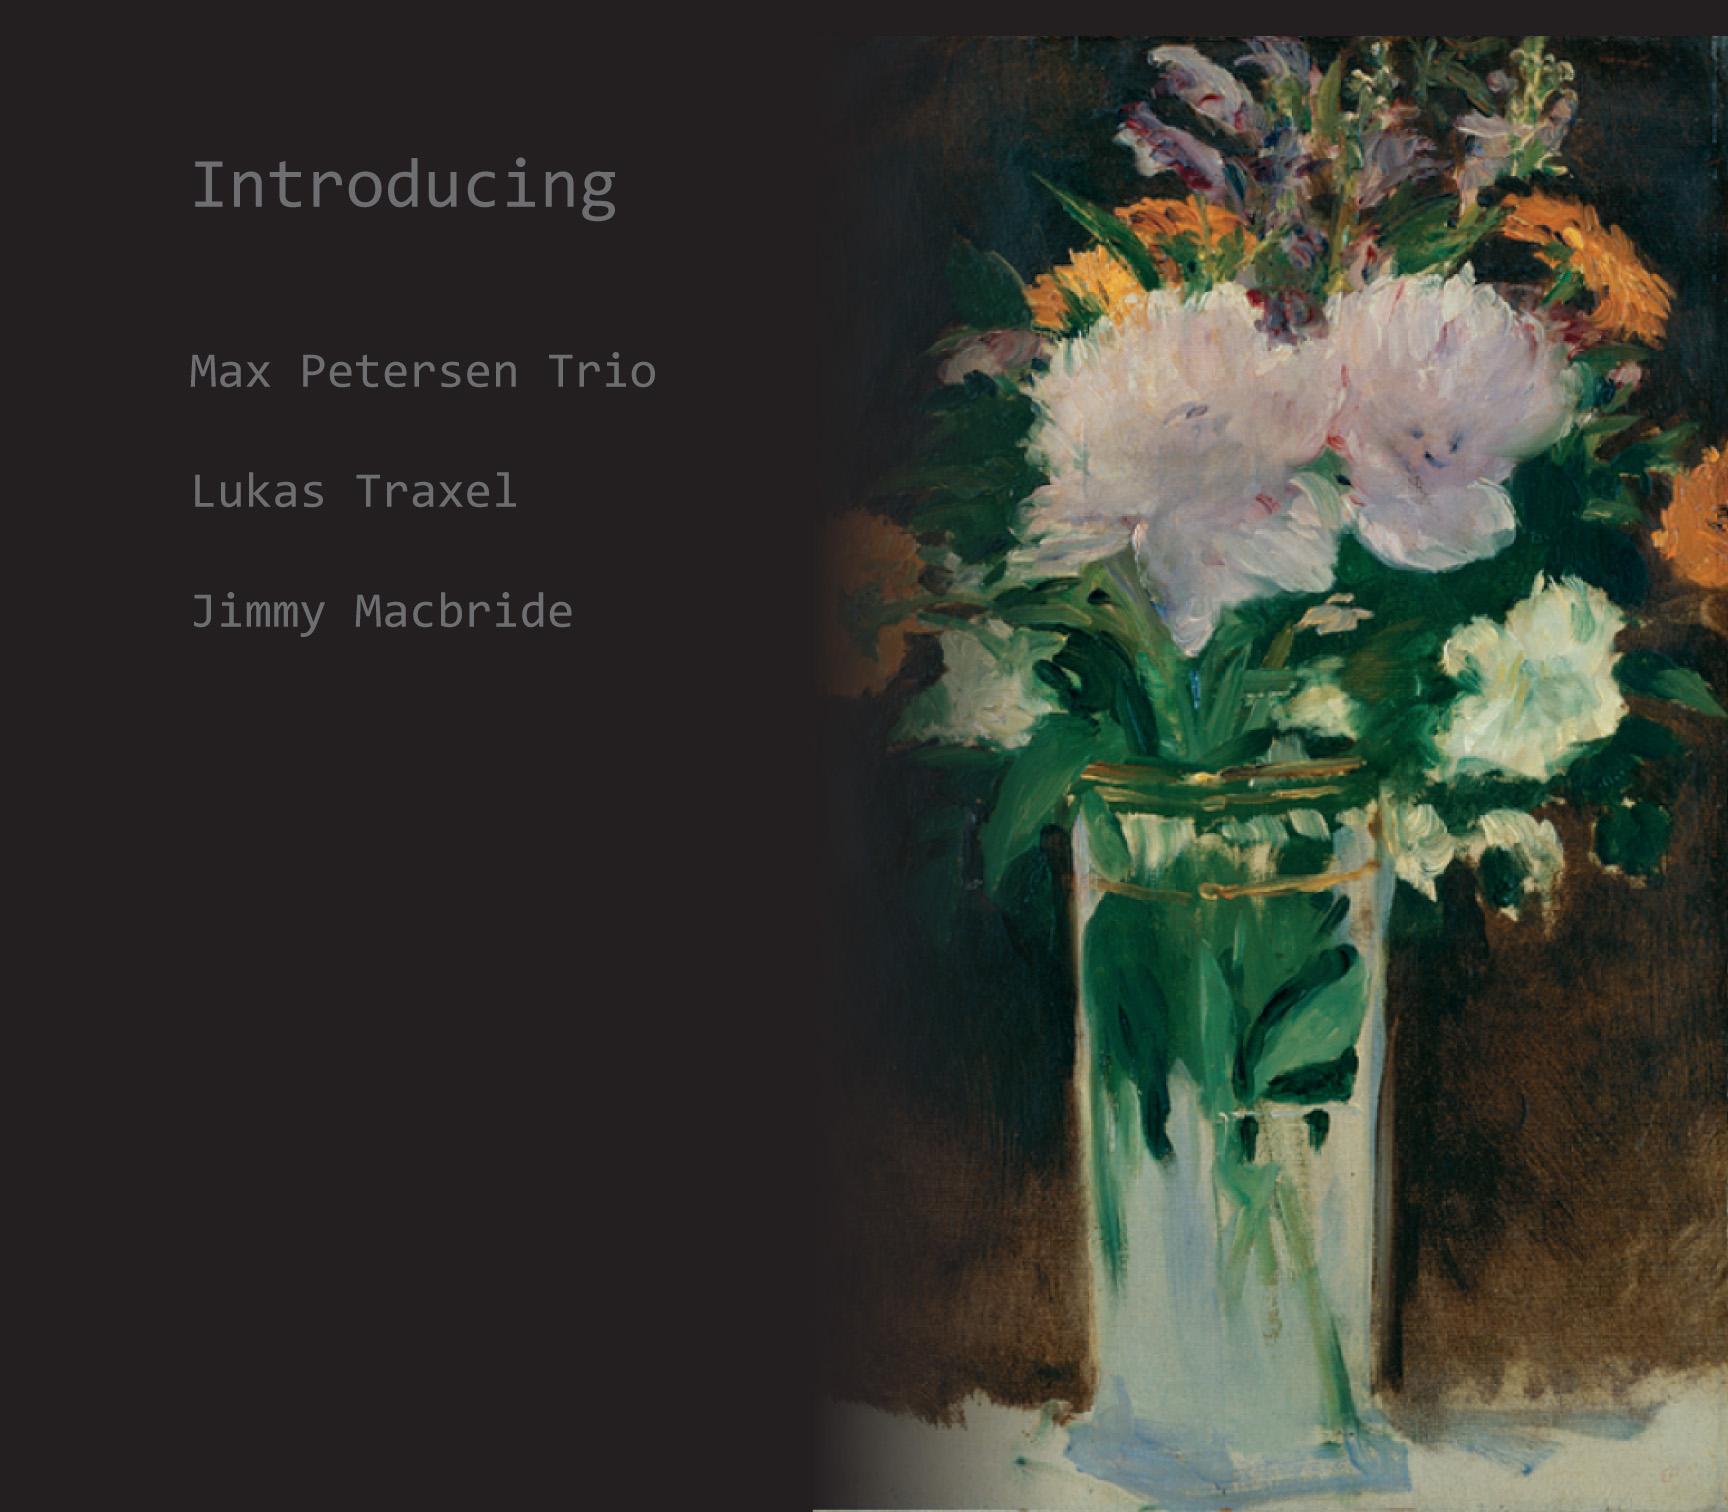 Max Petersen - Introducing (2015)